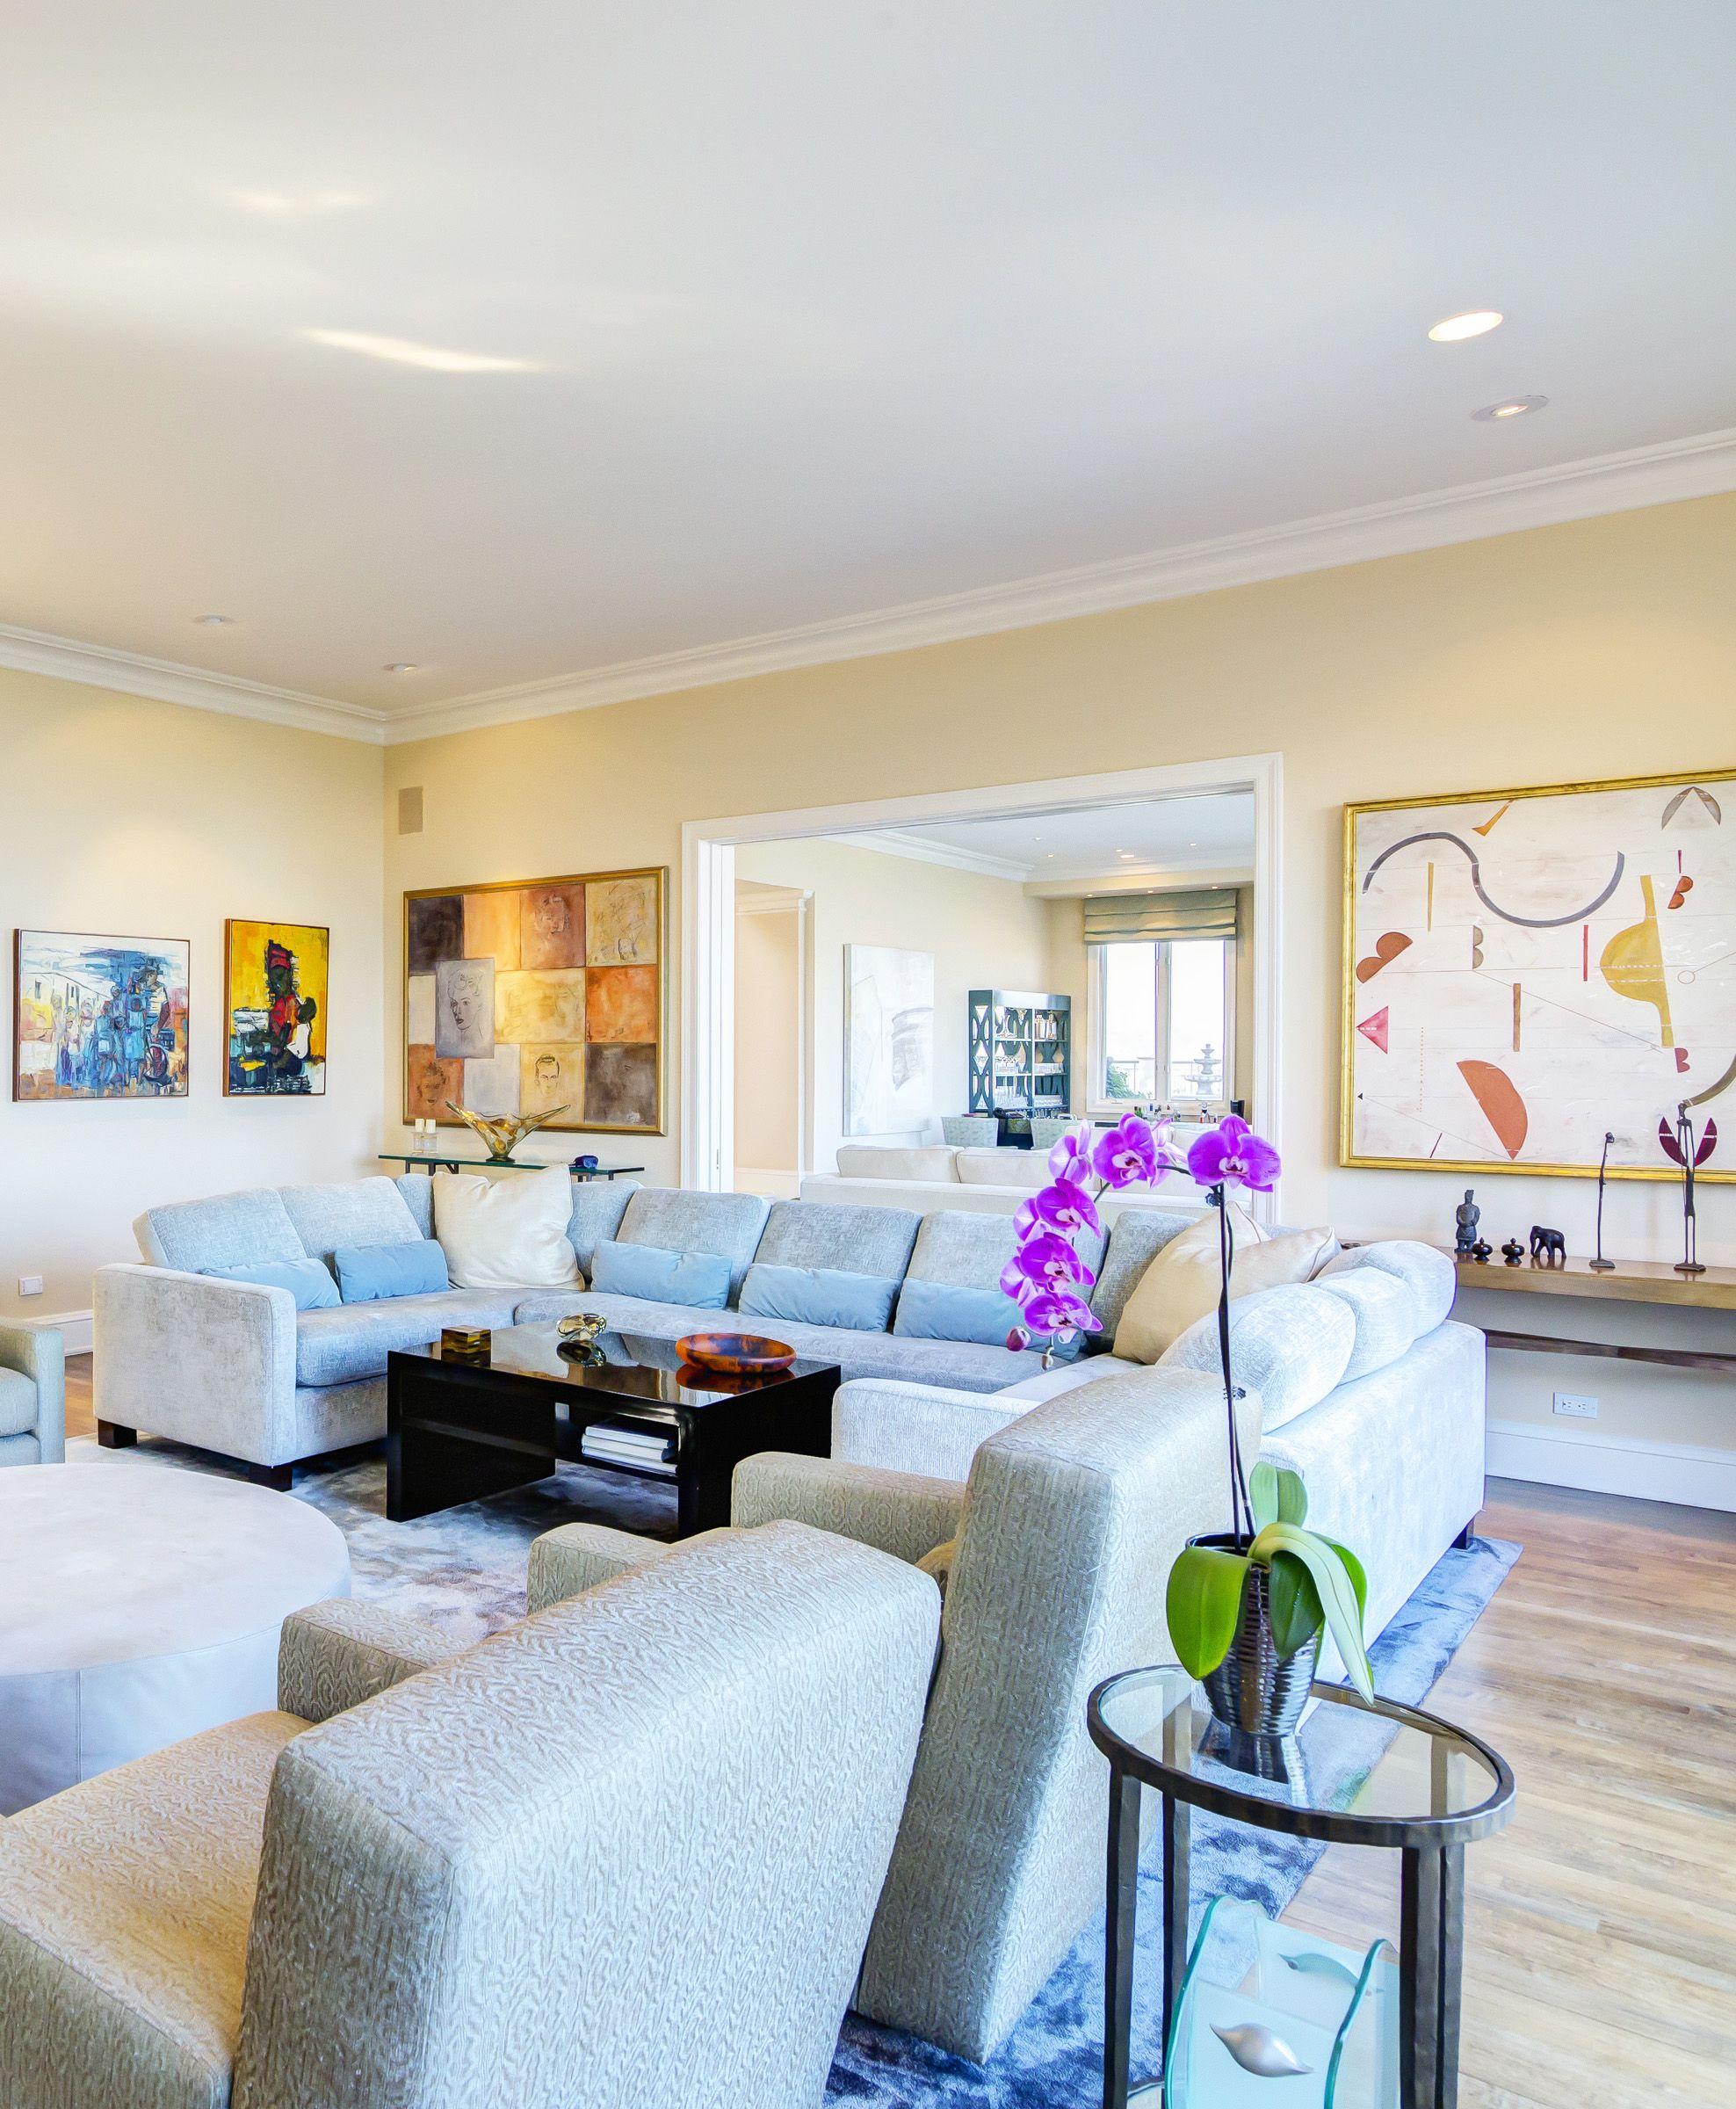 Living Room Furniture Contemporary Design Stunning Luxury Living Room With Contemporary Design And Furniturelos Review